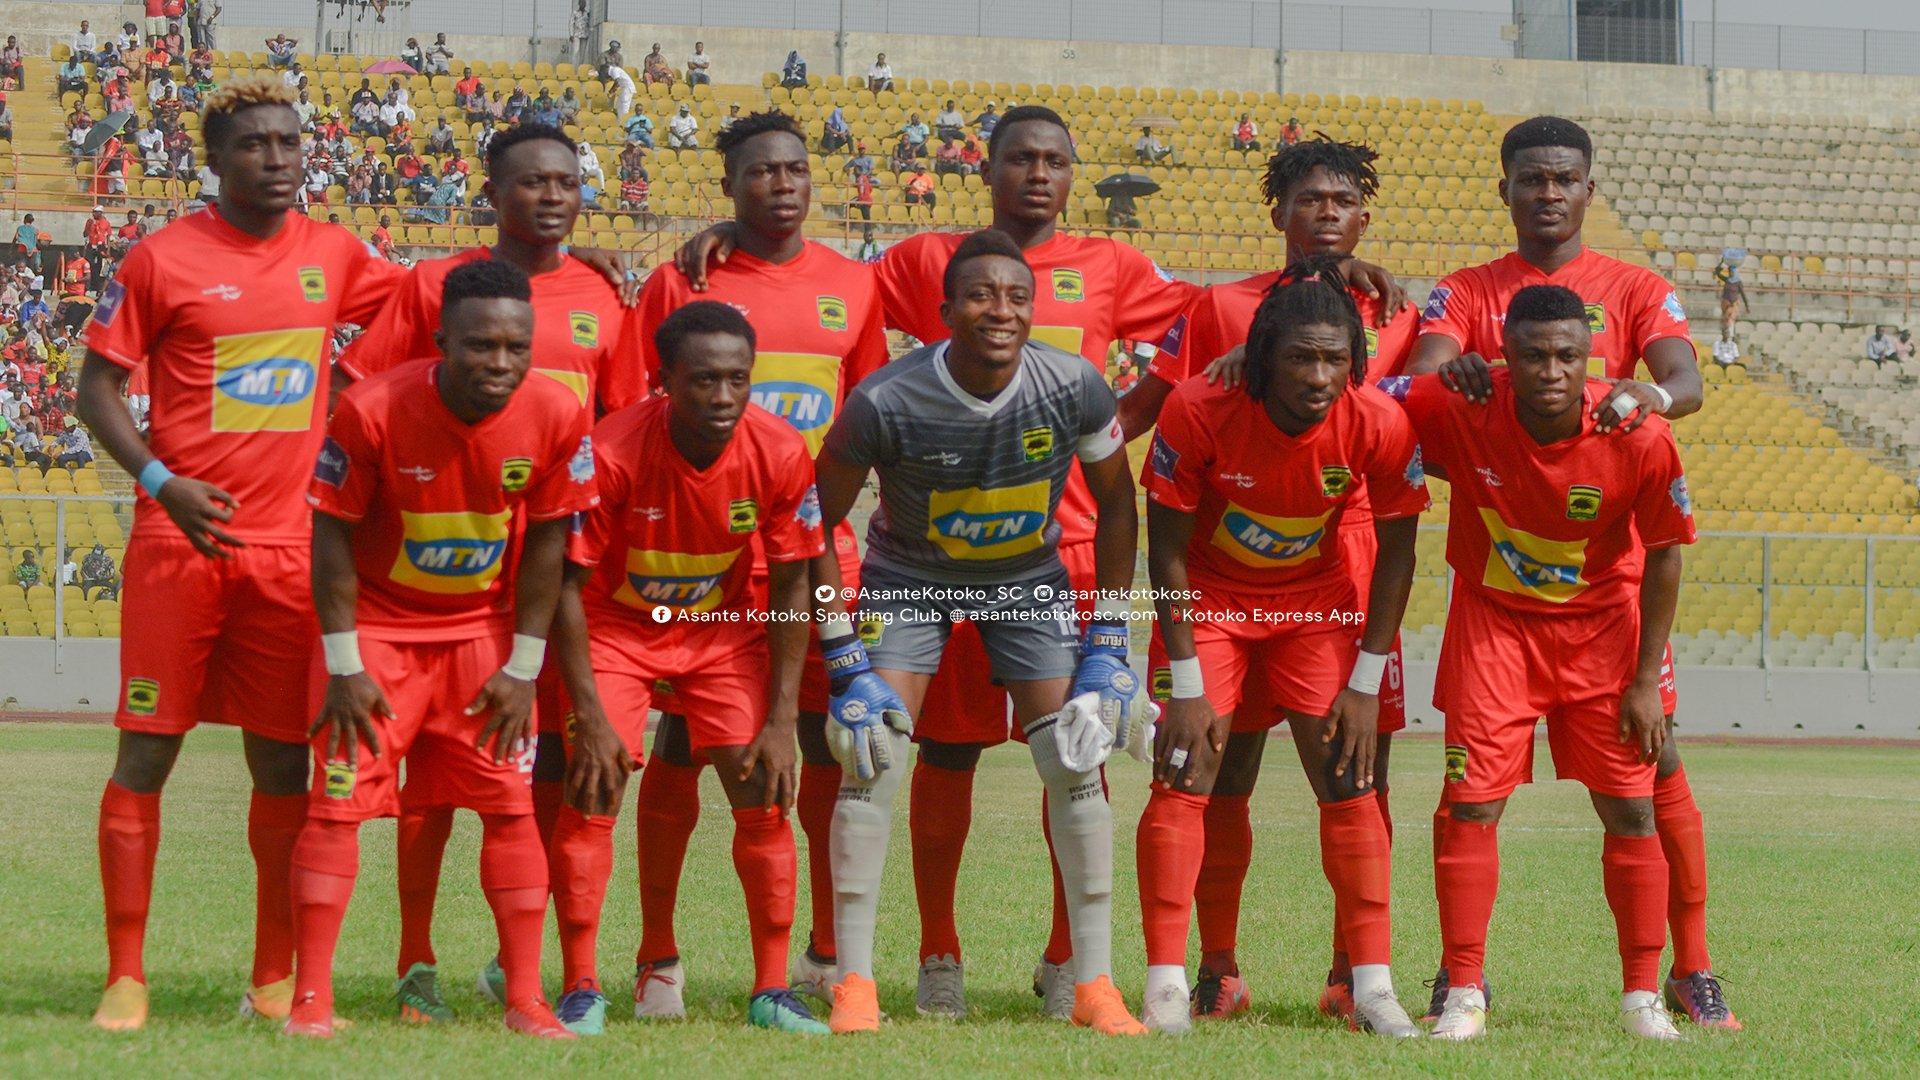 Kotoko will do wonders in next season's CAF Champions League – Seer Gyan